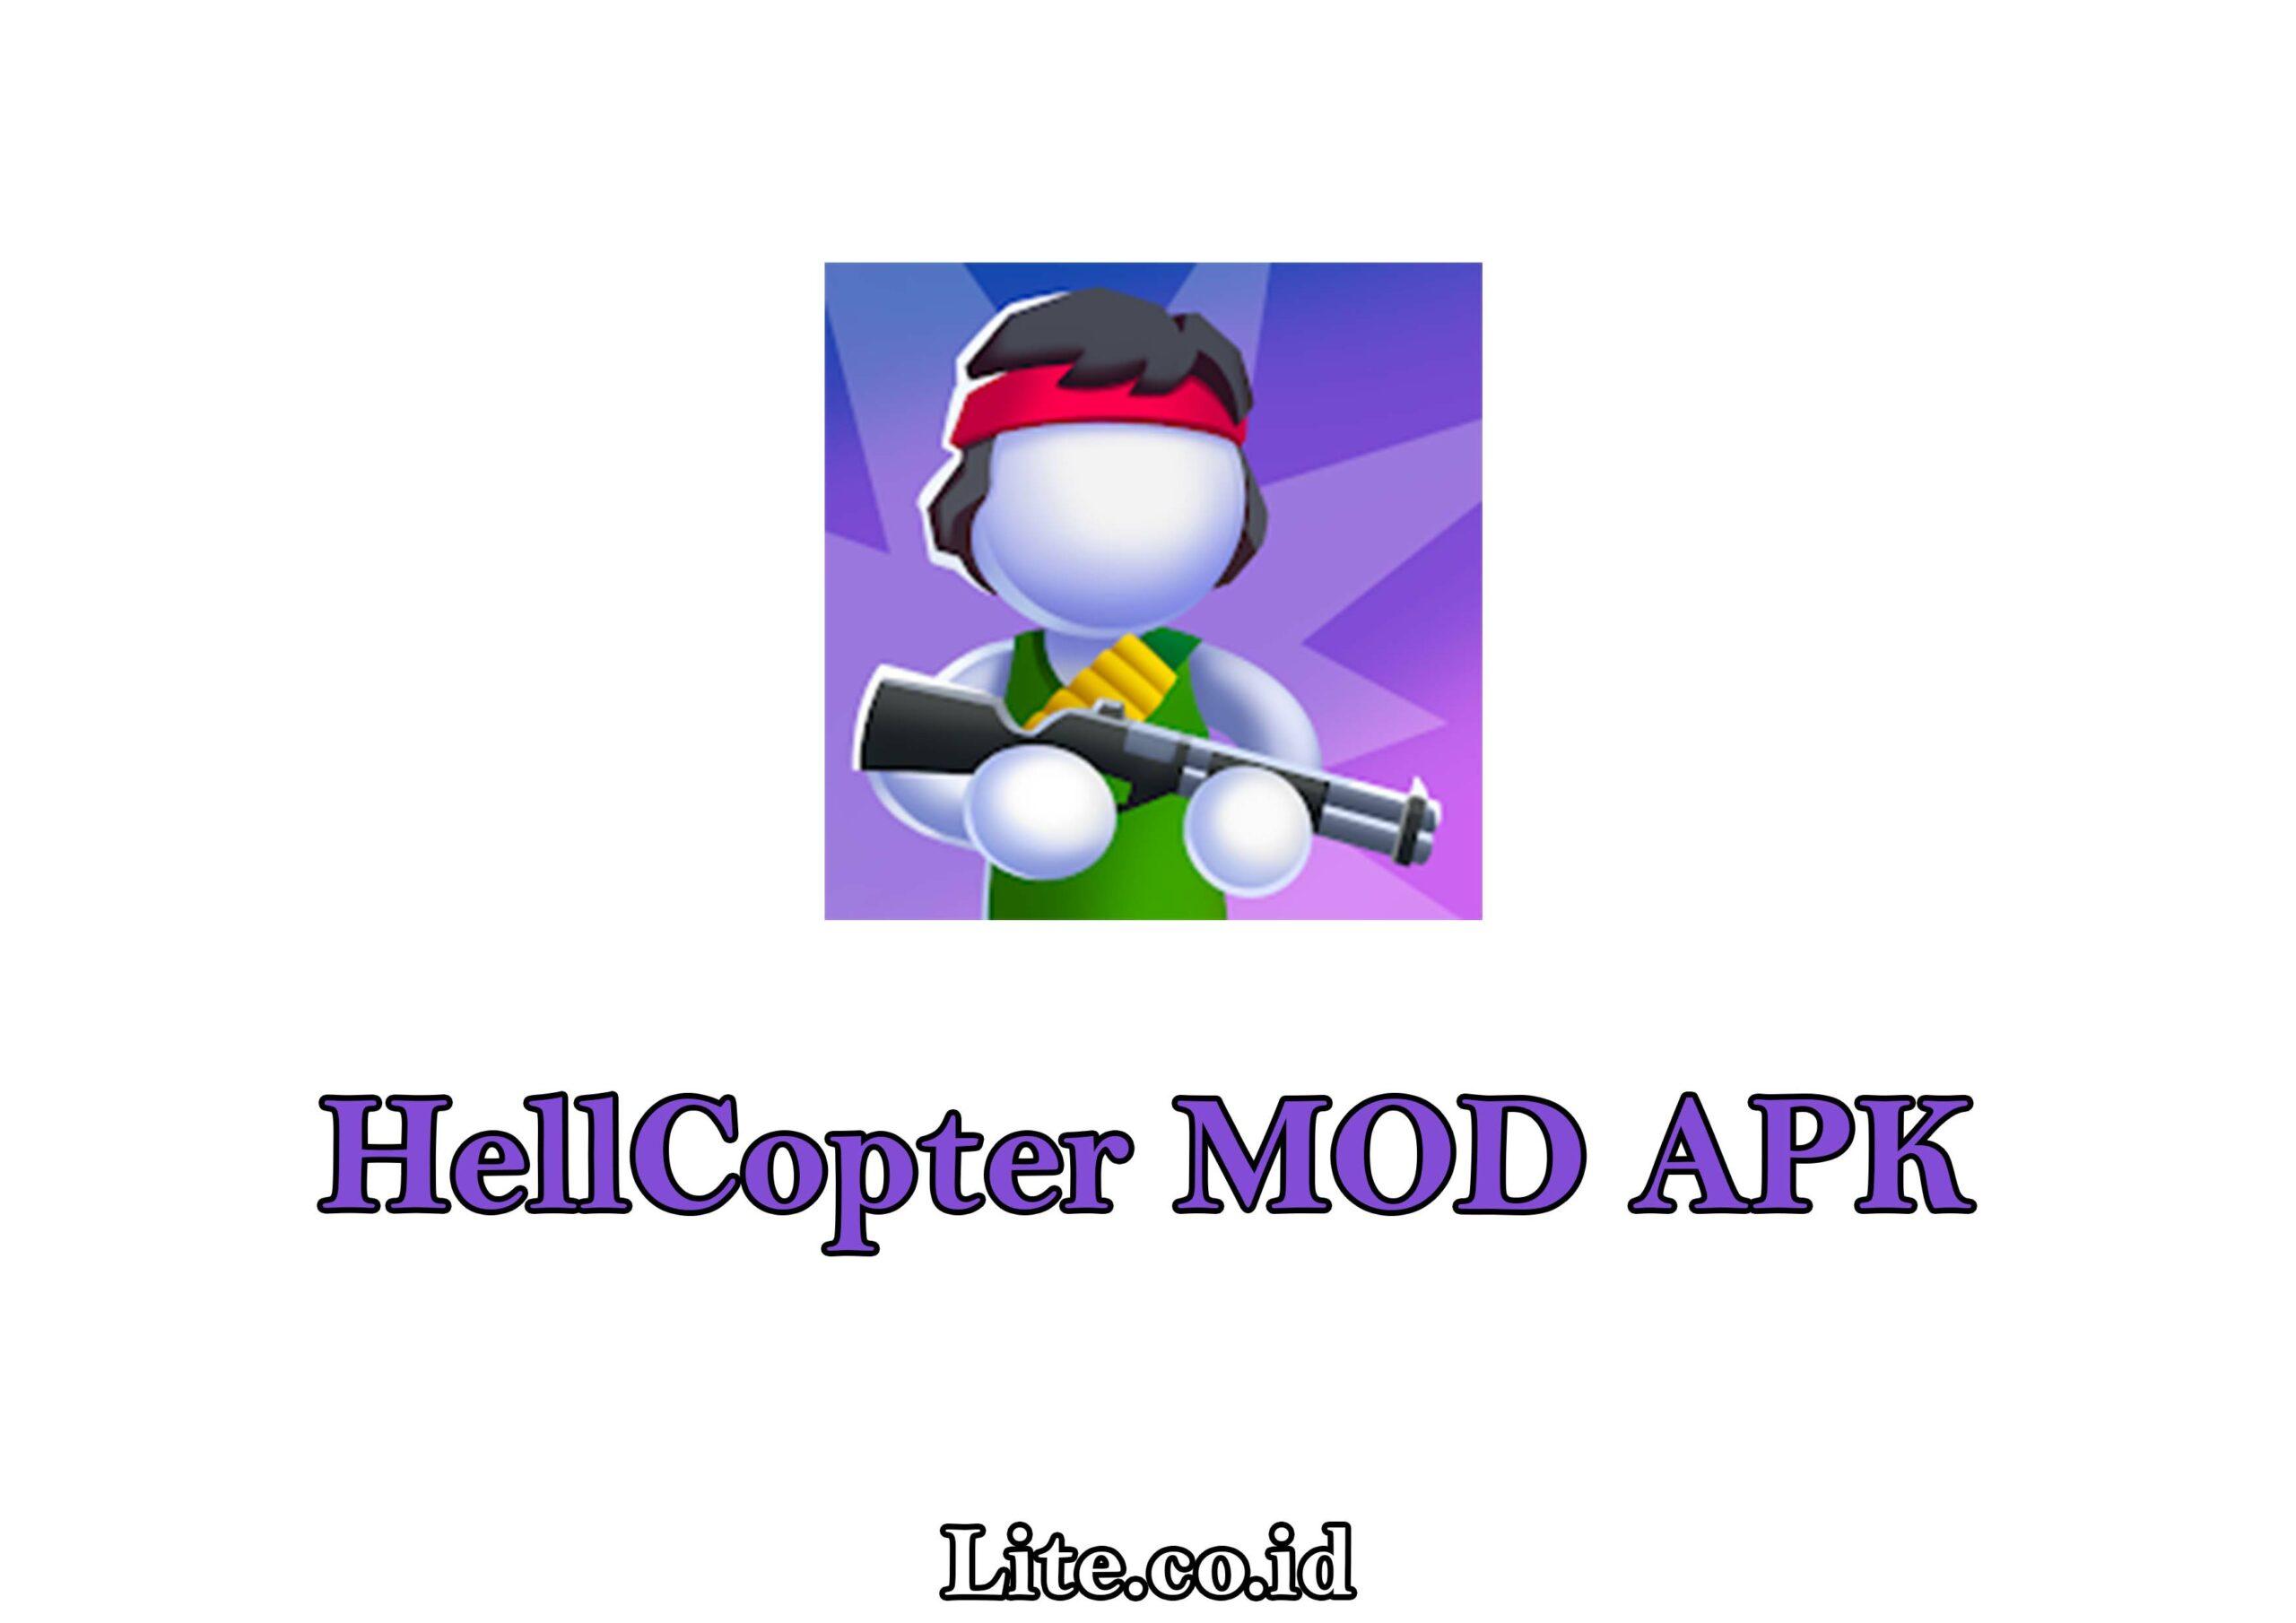 Hellcopter